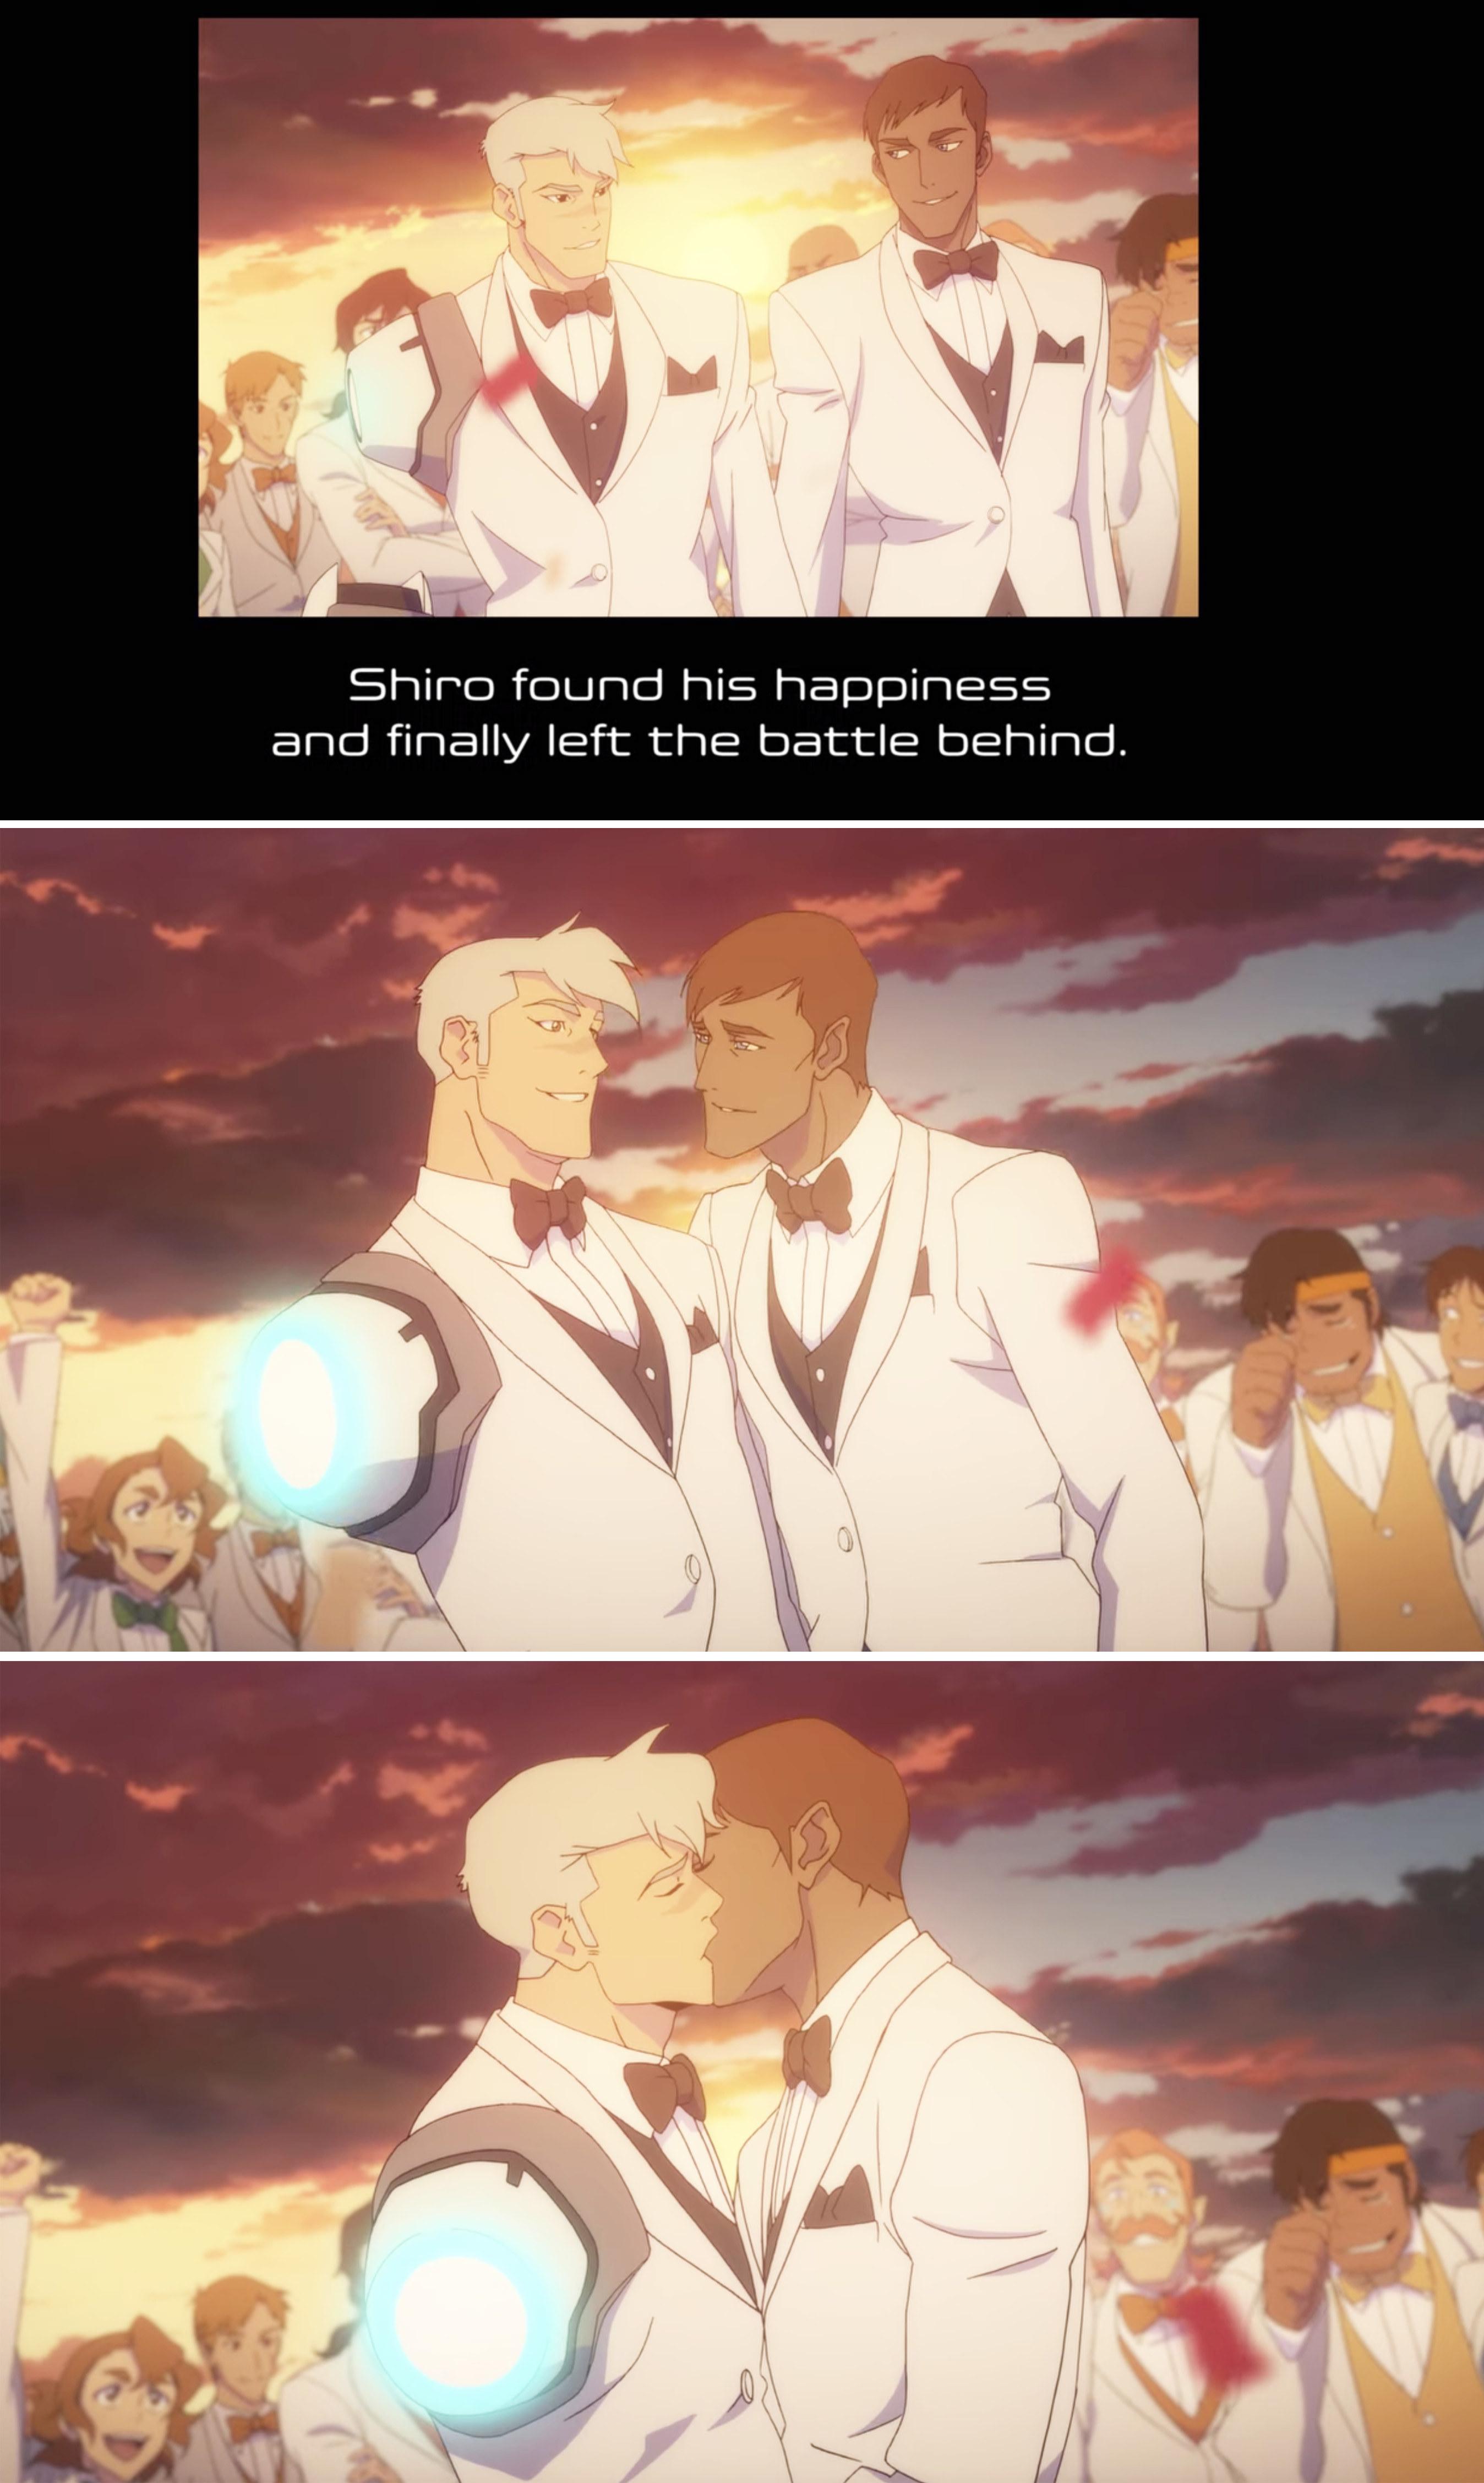 Shiro and his husband kissing